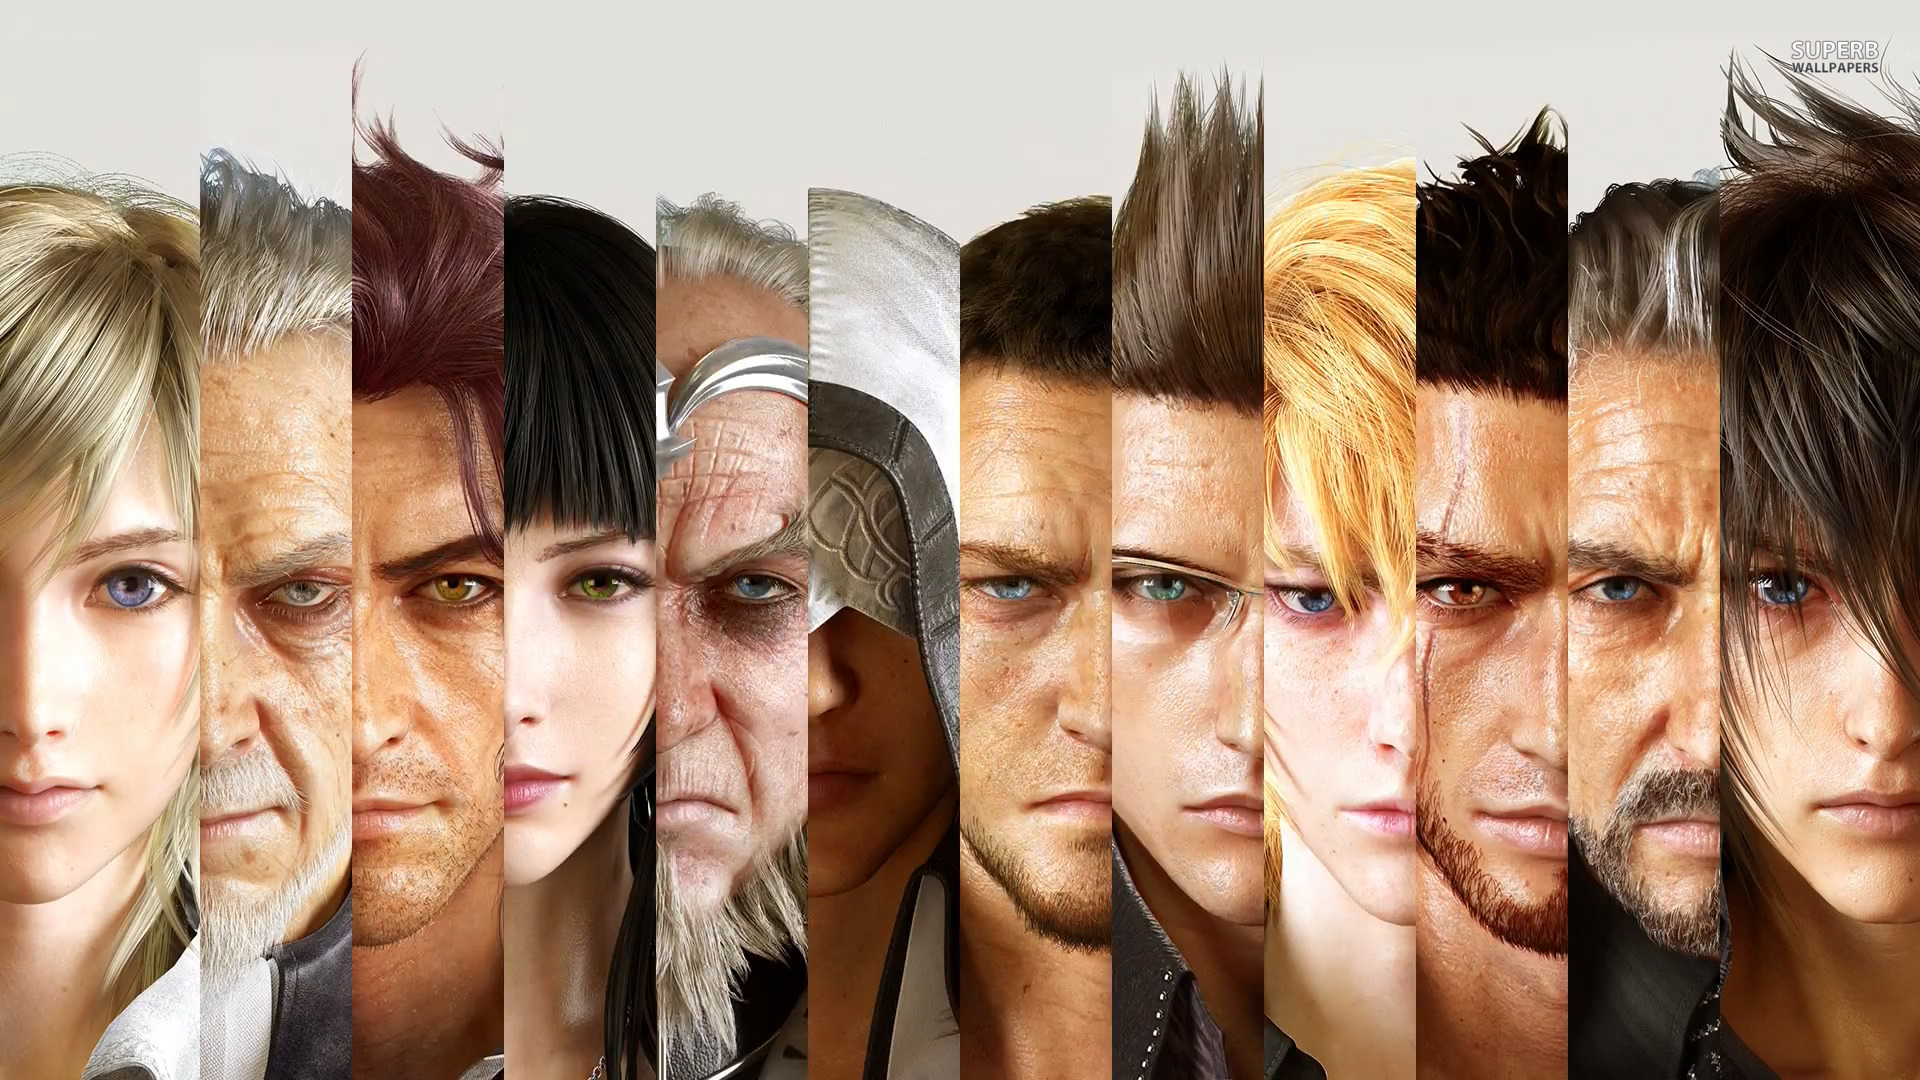 Final Fantasy Xv Hd Wallpaper Background Image 1920x1080 Id